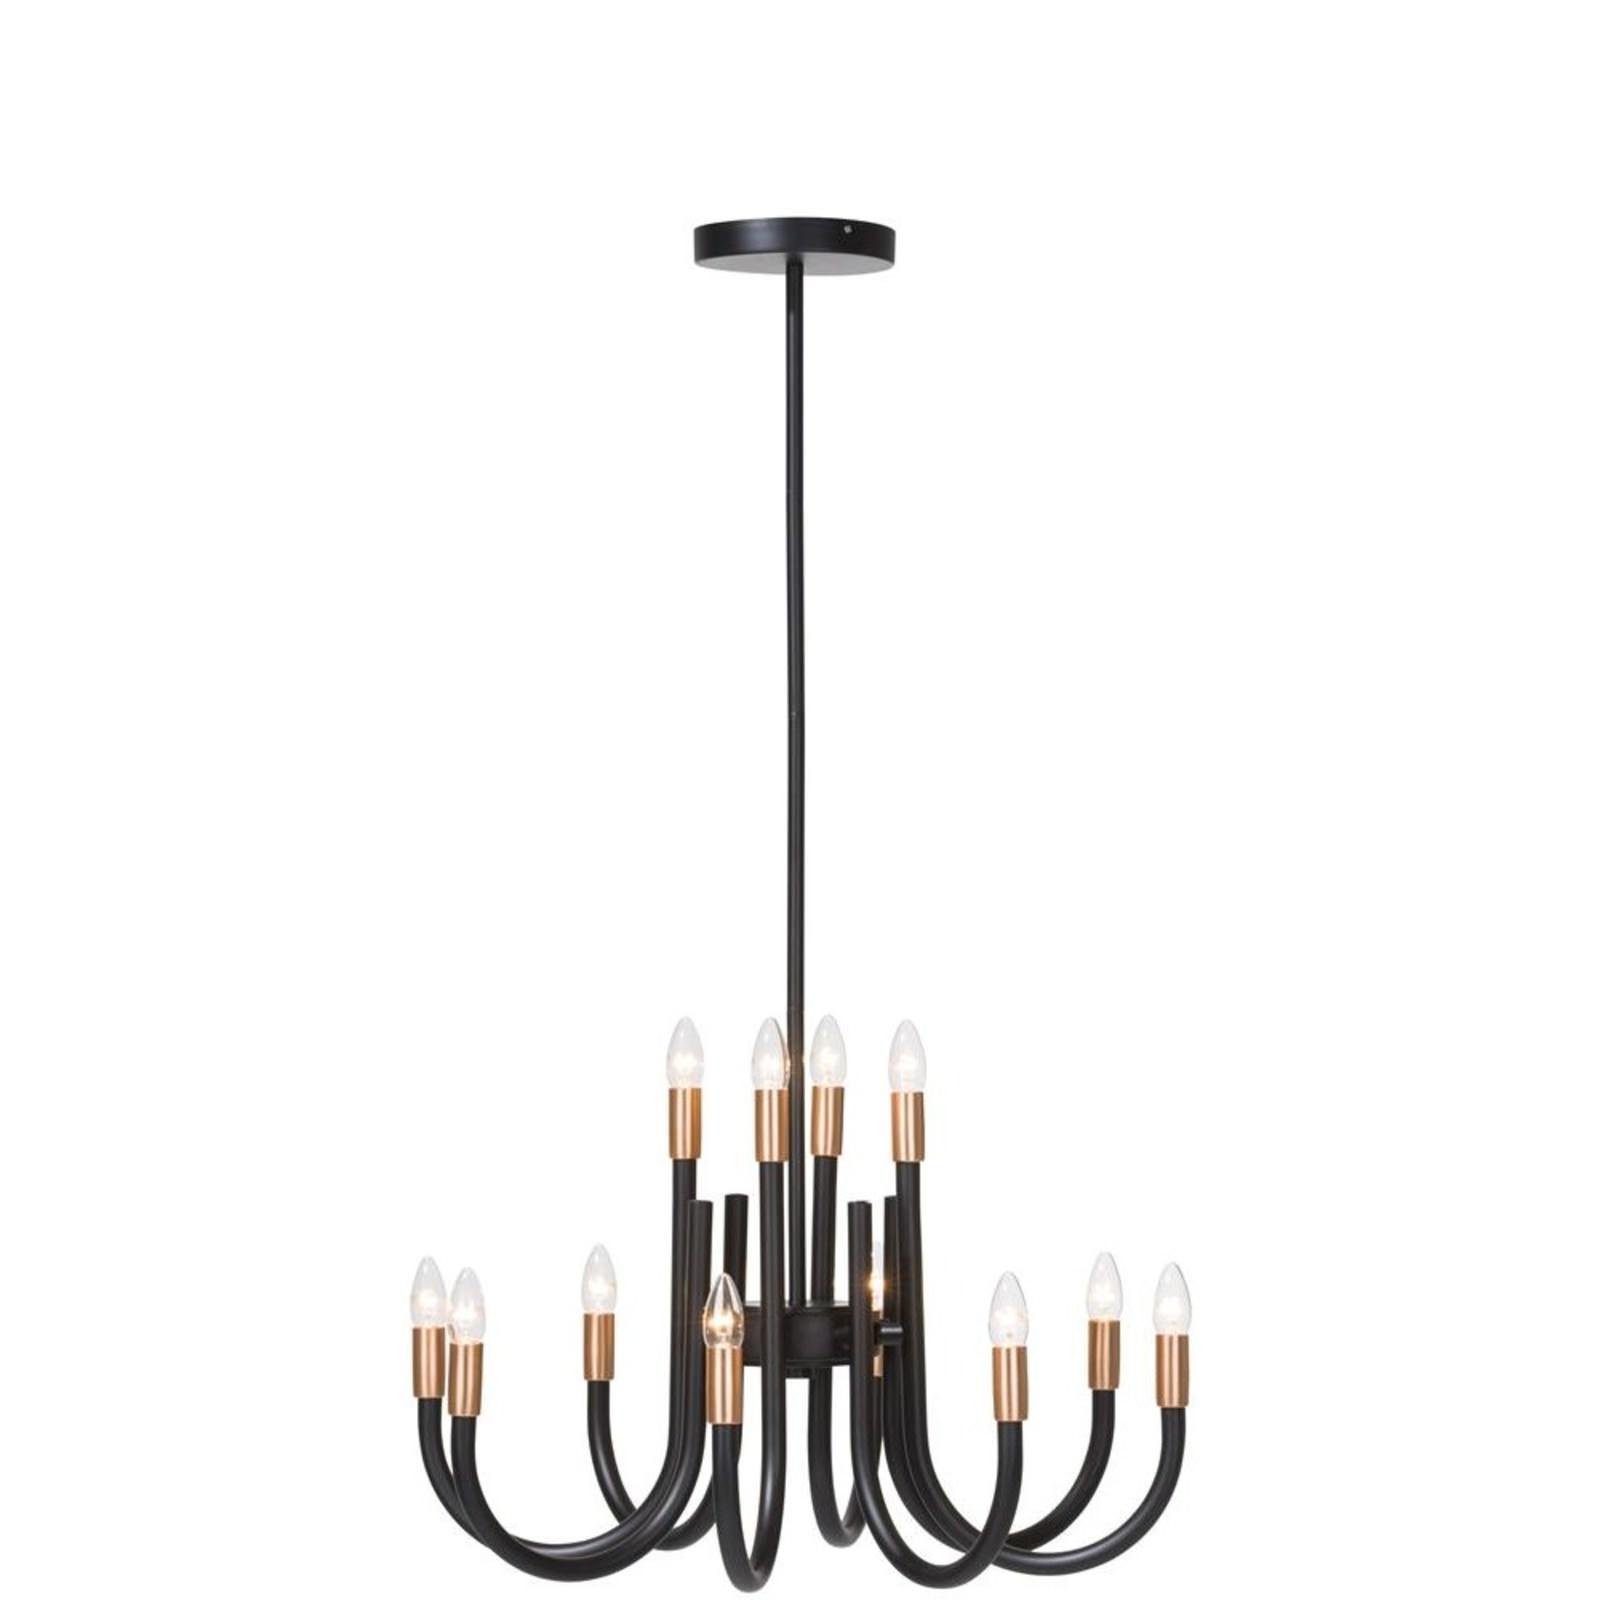 hanglamp lola in zwart nu bestellen in de coco maison webshop. Black Bedroom Furniture Sets. Home Design Ideas